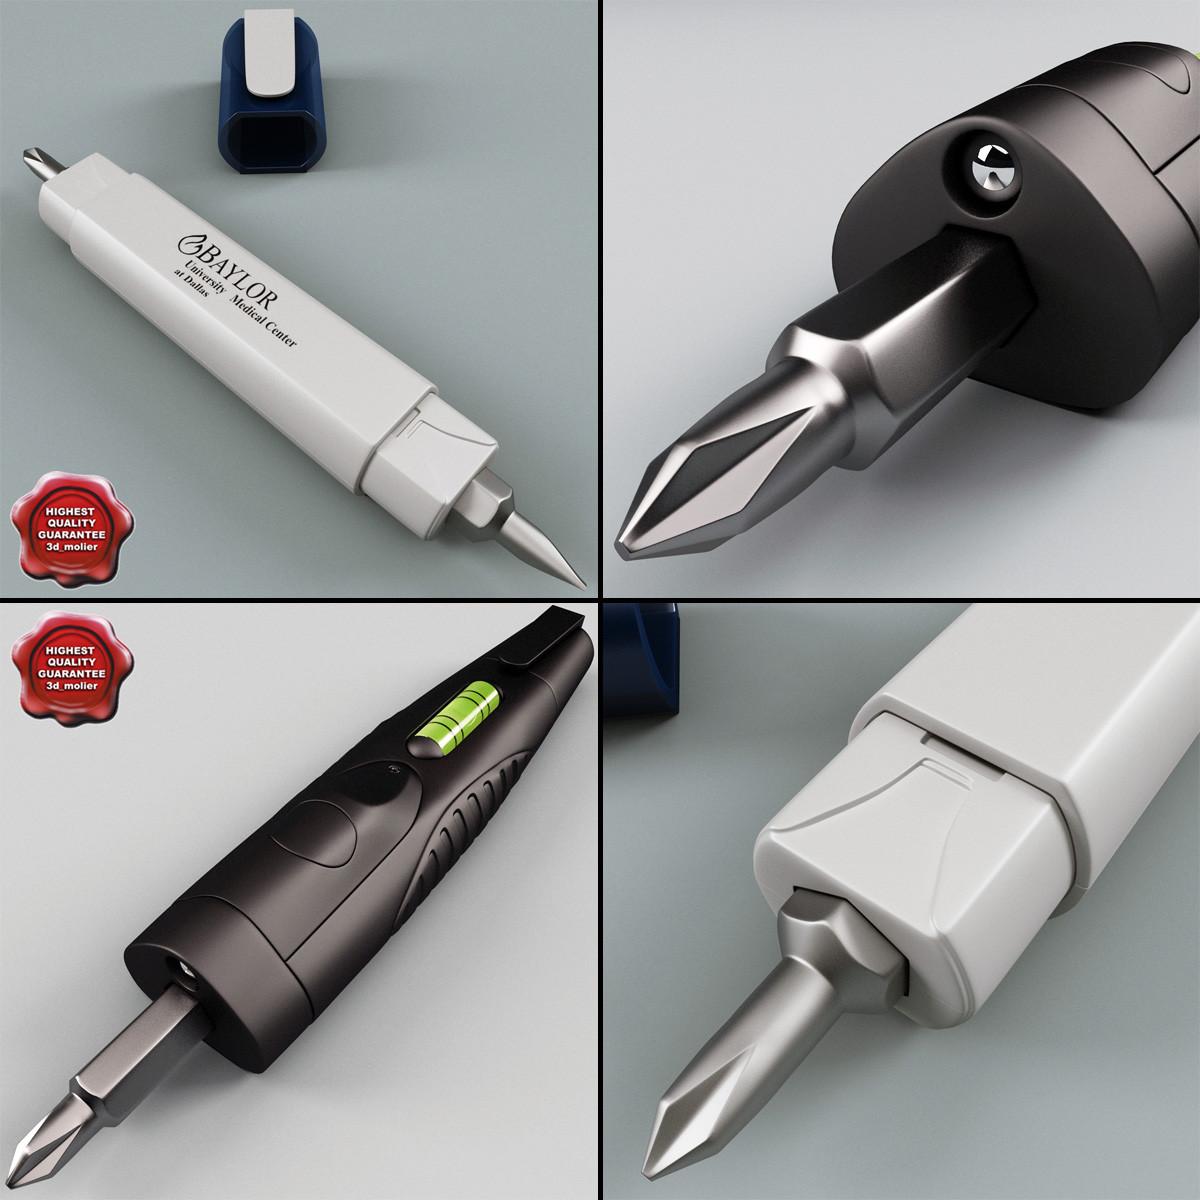 maya pocket screwdrivers